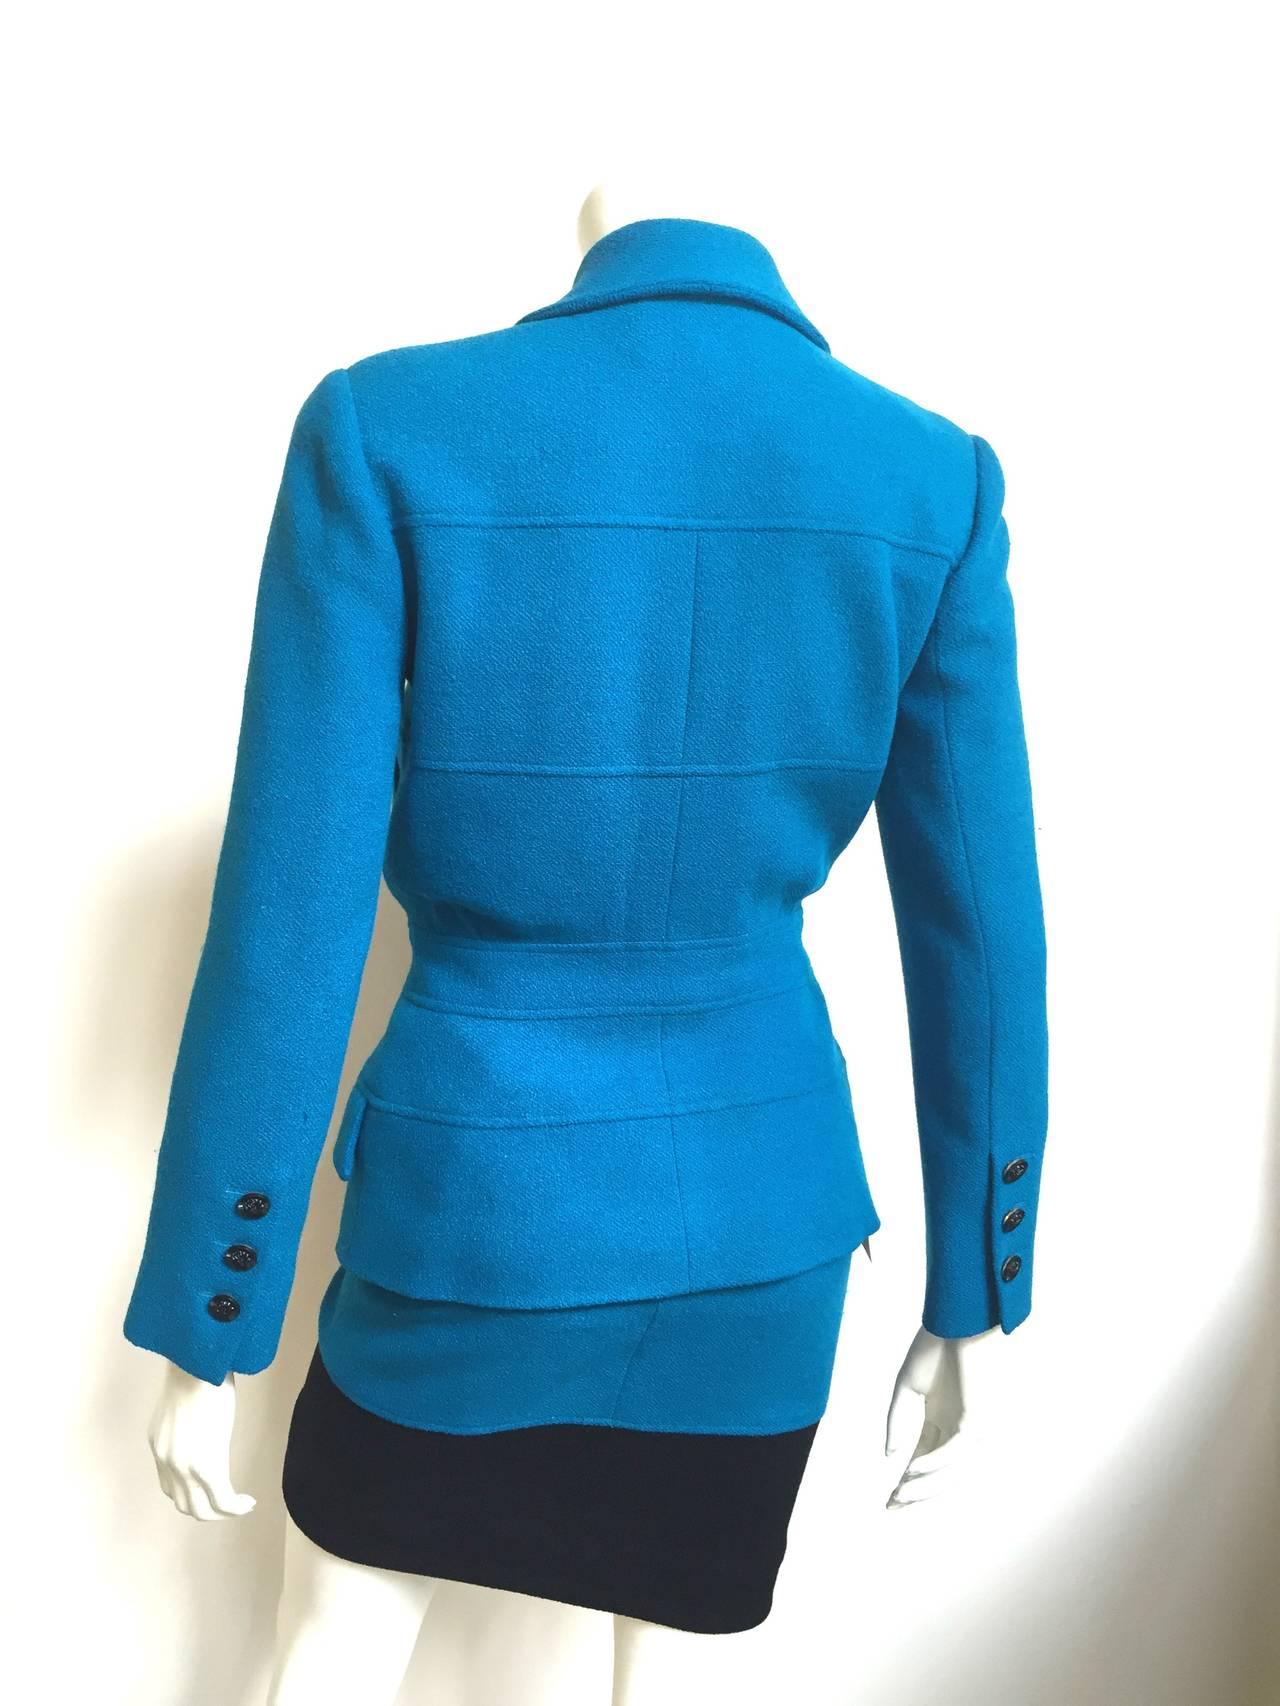 Karl Lagerfeld 80s Wool Skirt Suit Size 4. 6